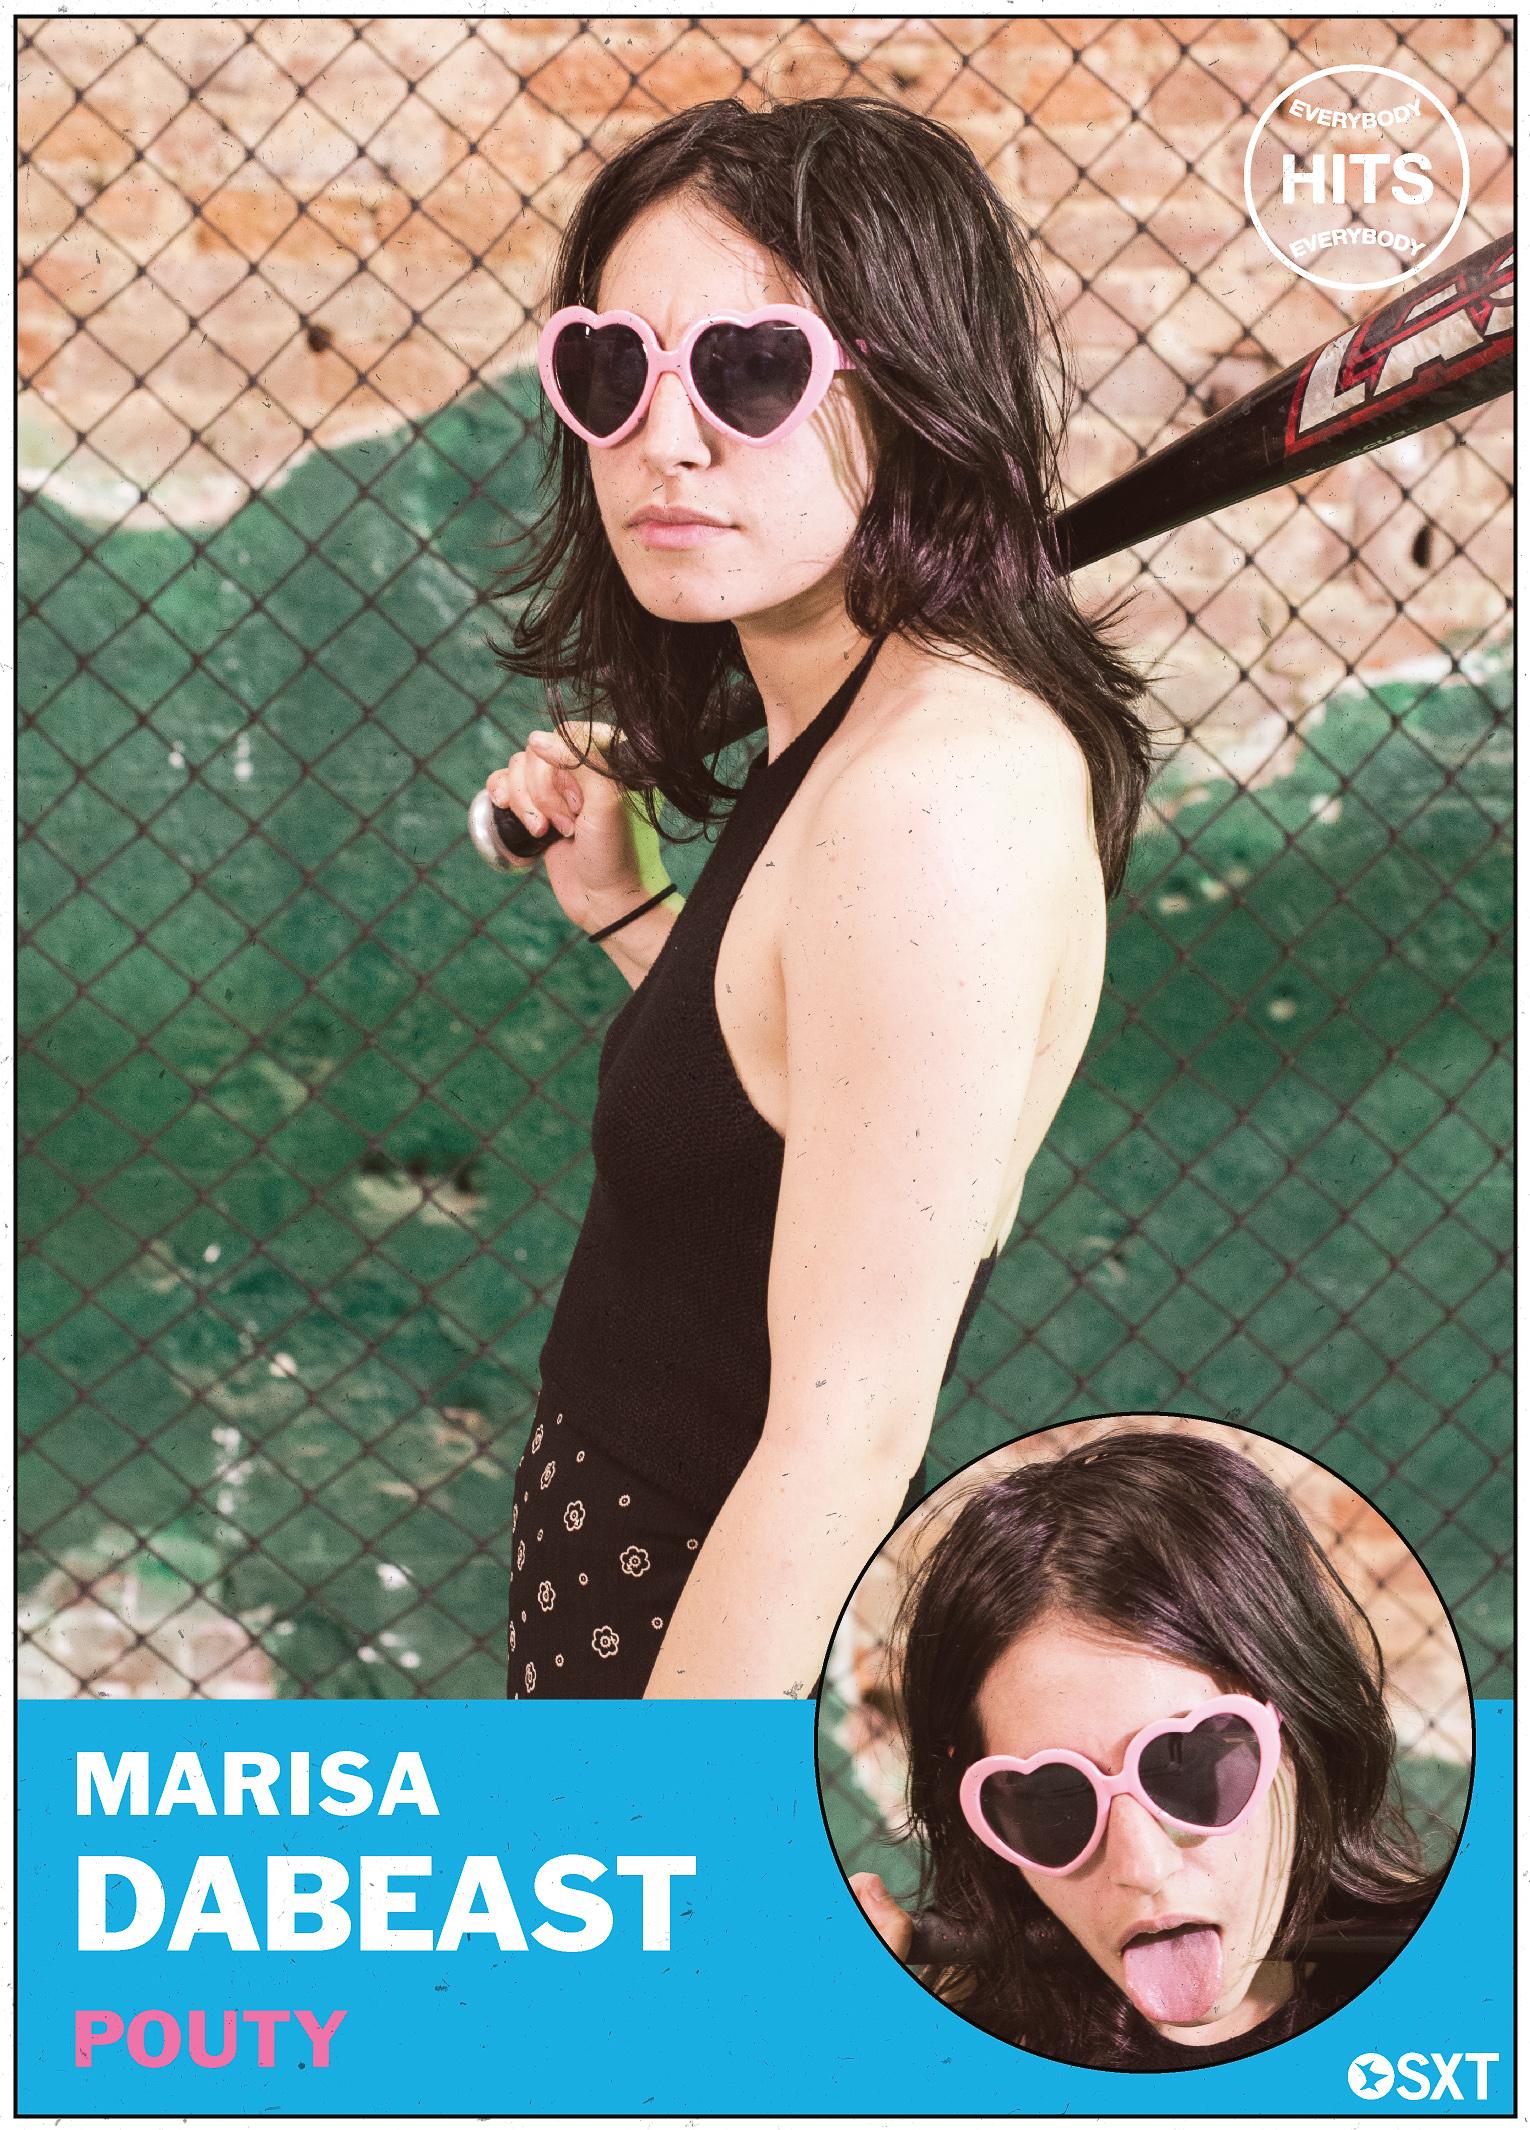 Marisa DeBeast of Pouty